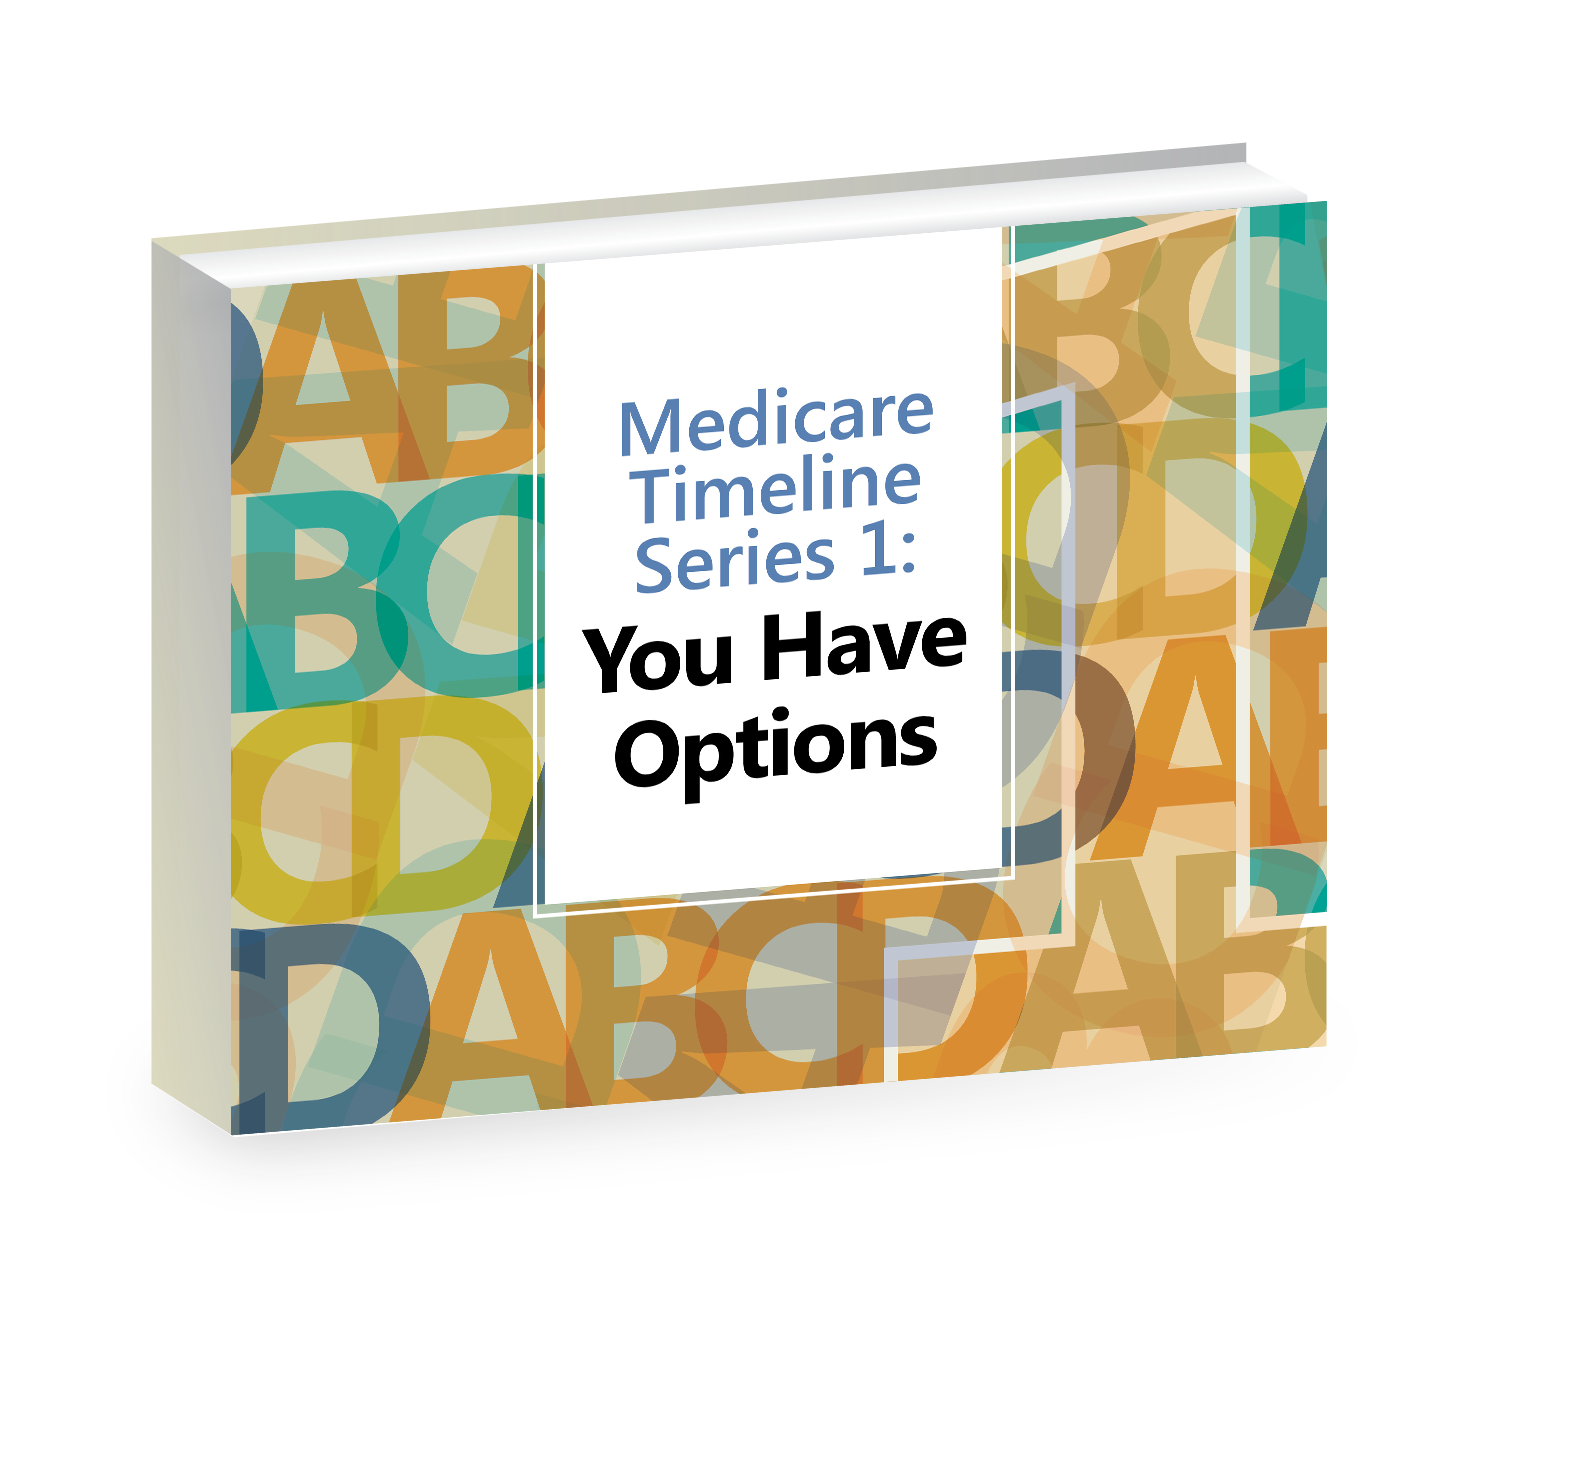 Medicare Timeline Series 1: You Have Options